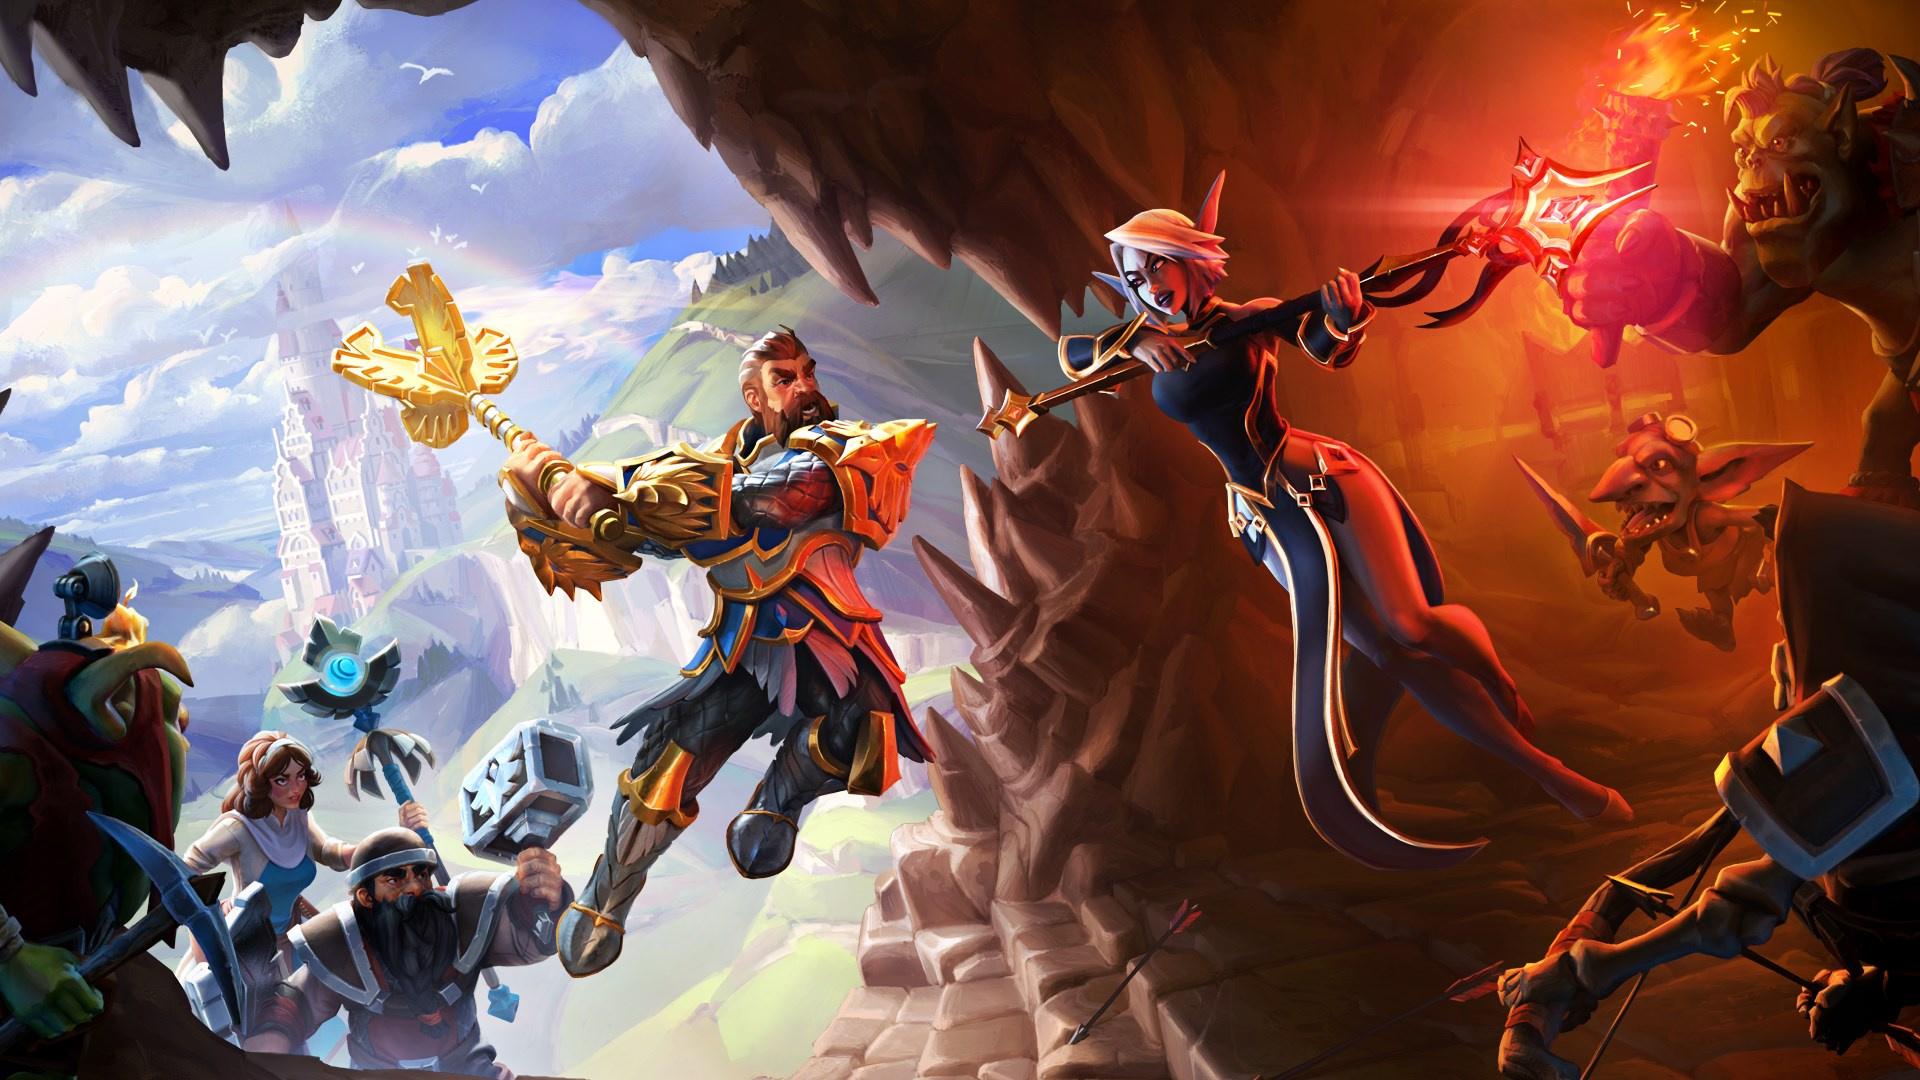 Kalypso выпустила полное собрание Dungeons3 — Complete Collection